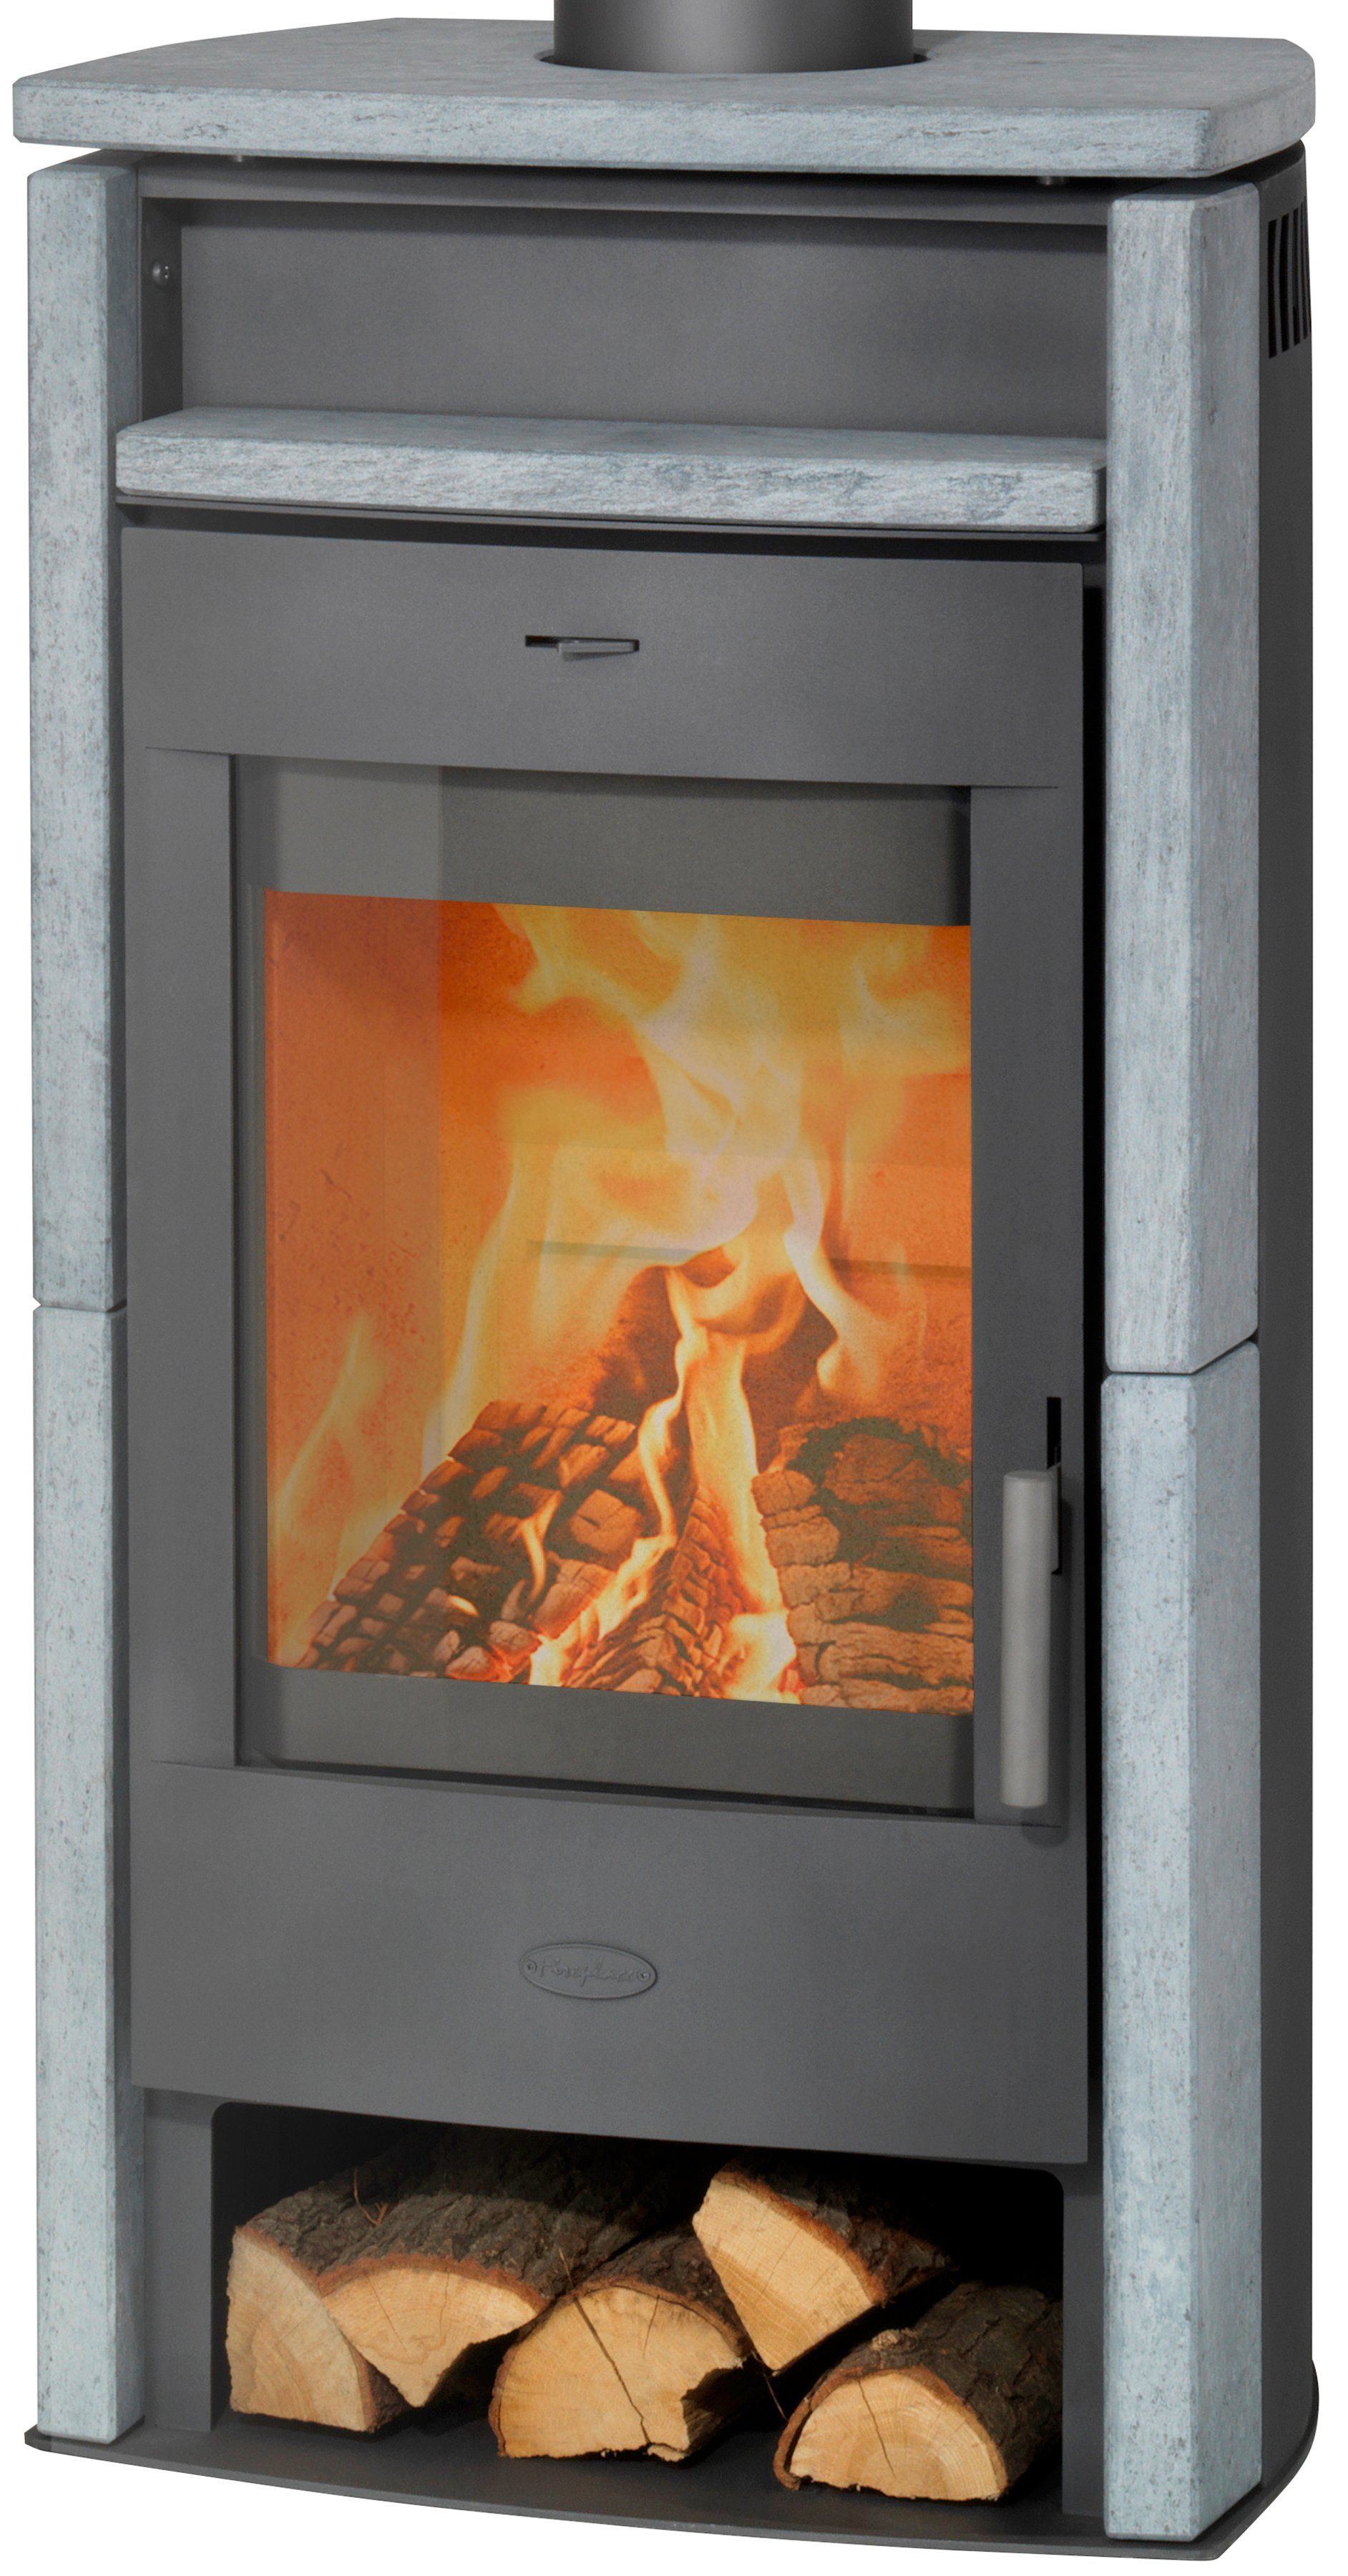 Kaminofen »Paris«, Naturstein, 6 kW, Panoramasichtscheibe, Fireplace